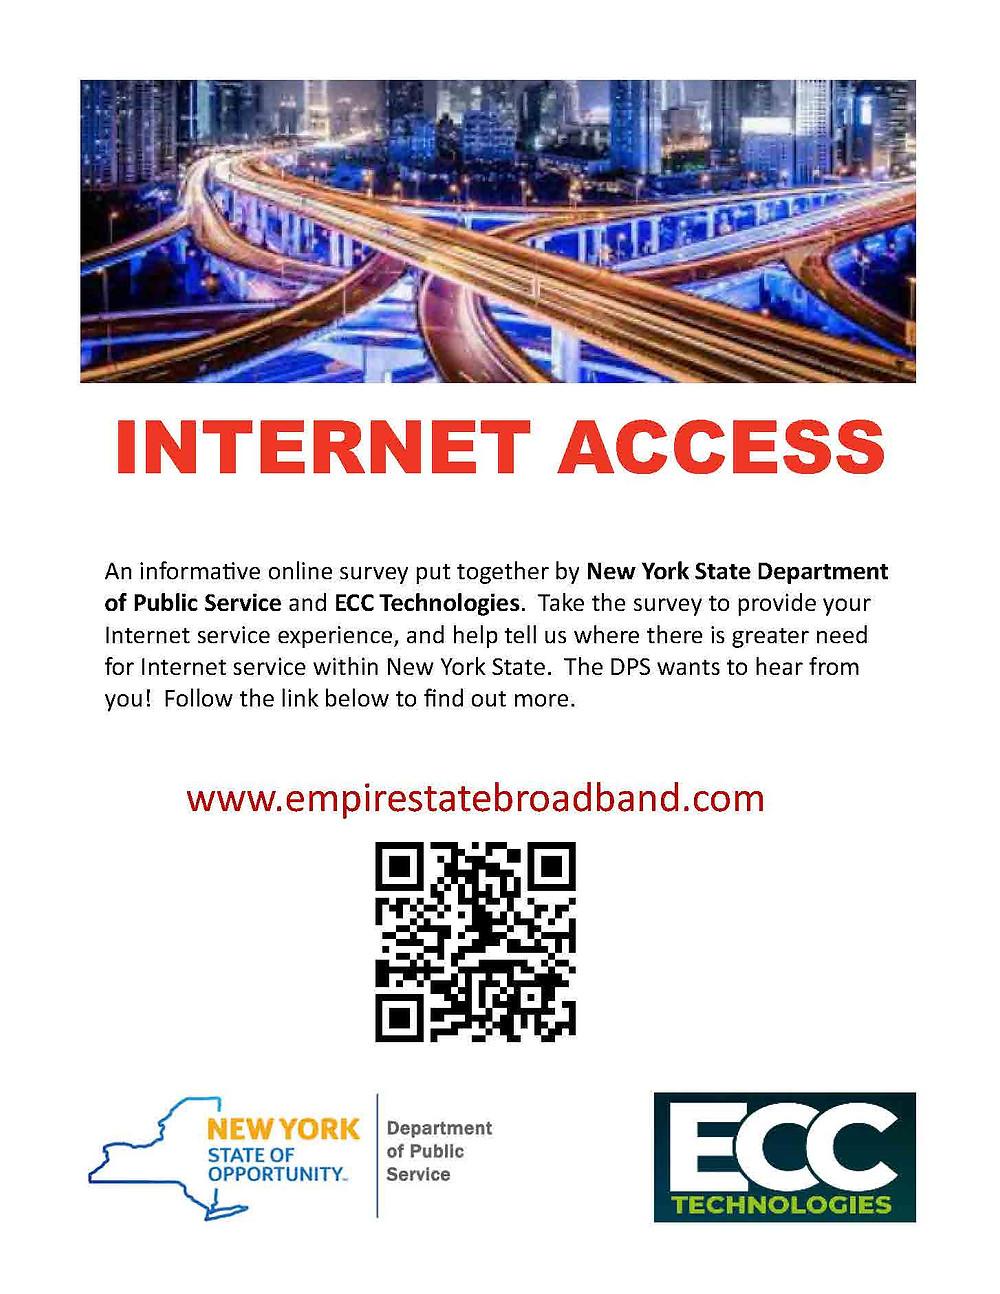 Internet service experience survey